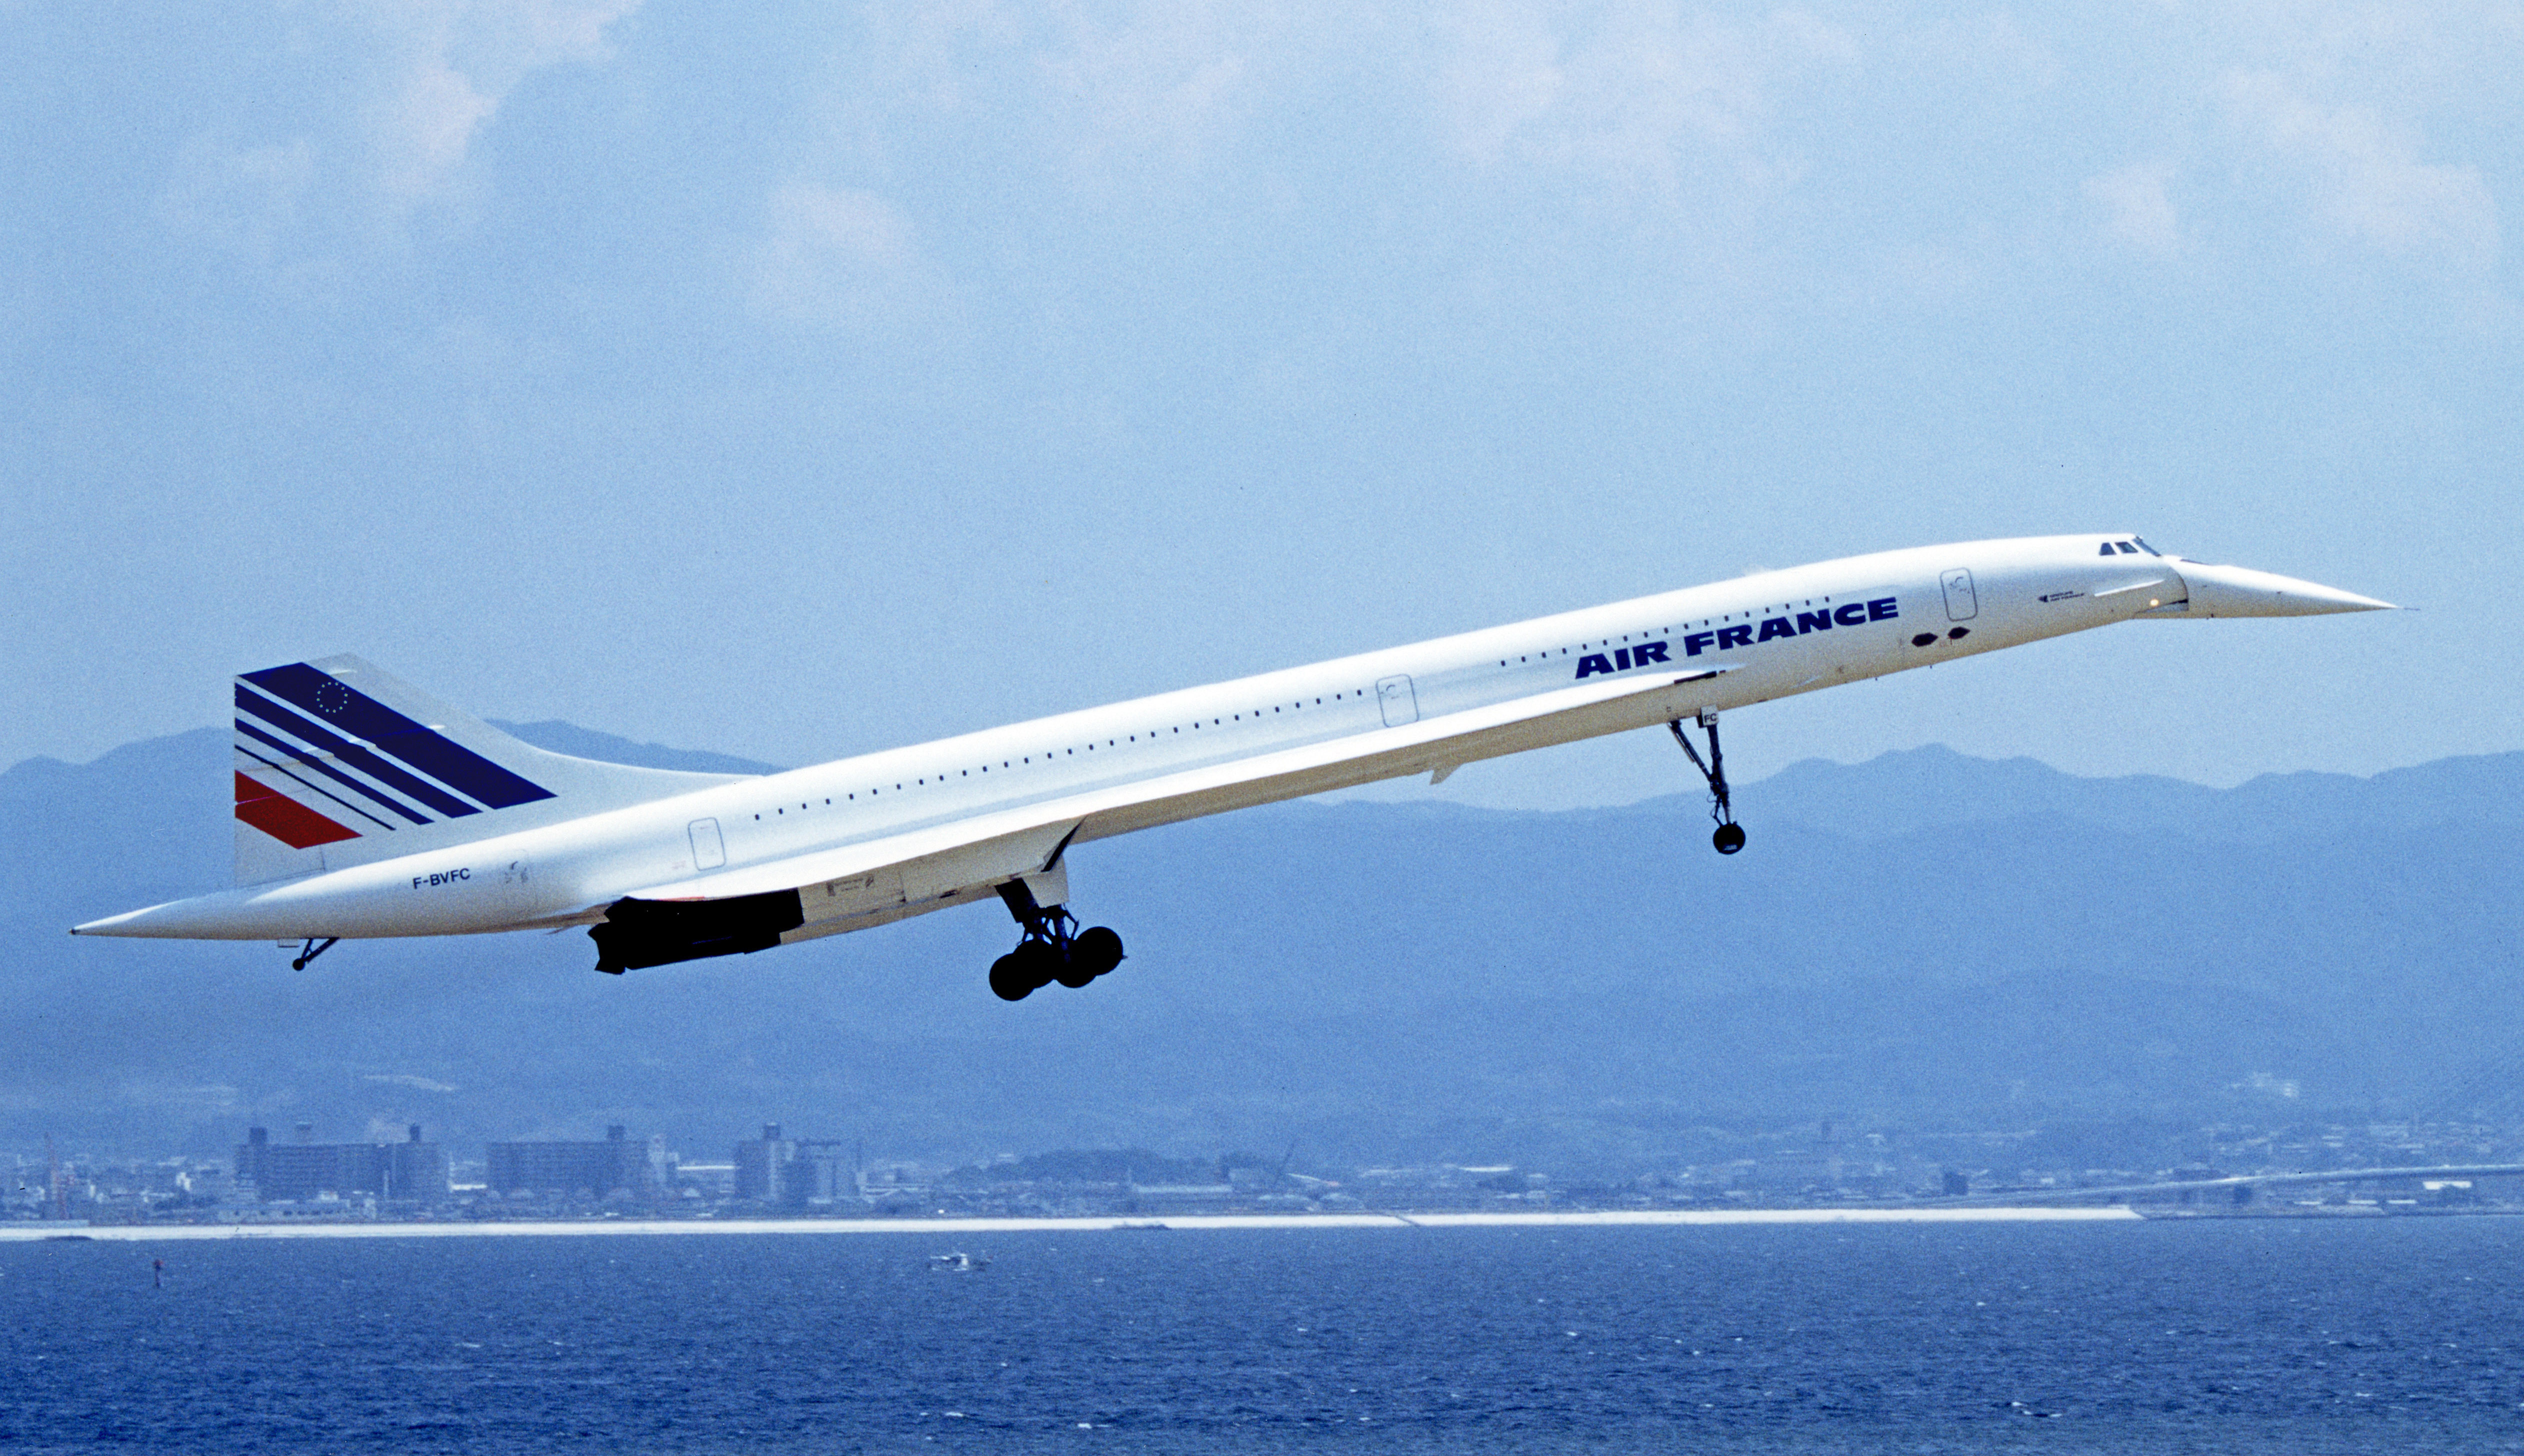 Concorde_1_94-9-5_kix_(cropped).jpg